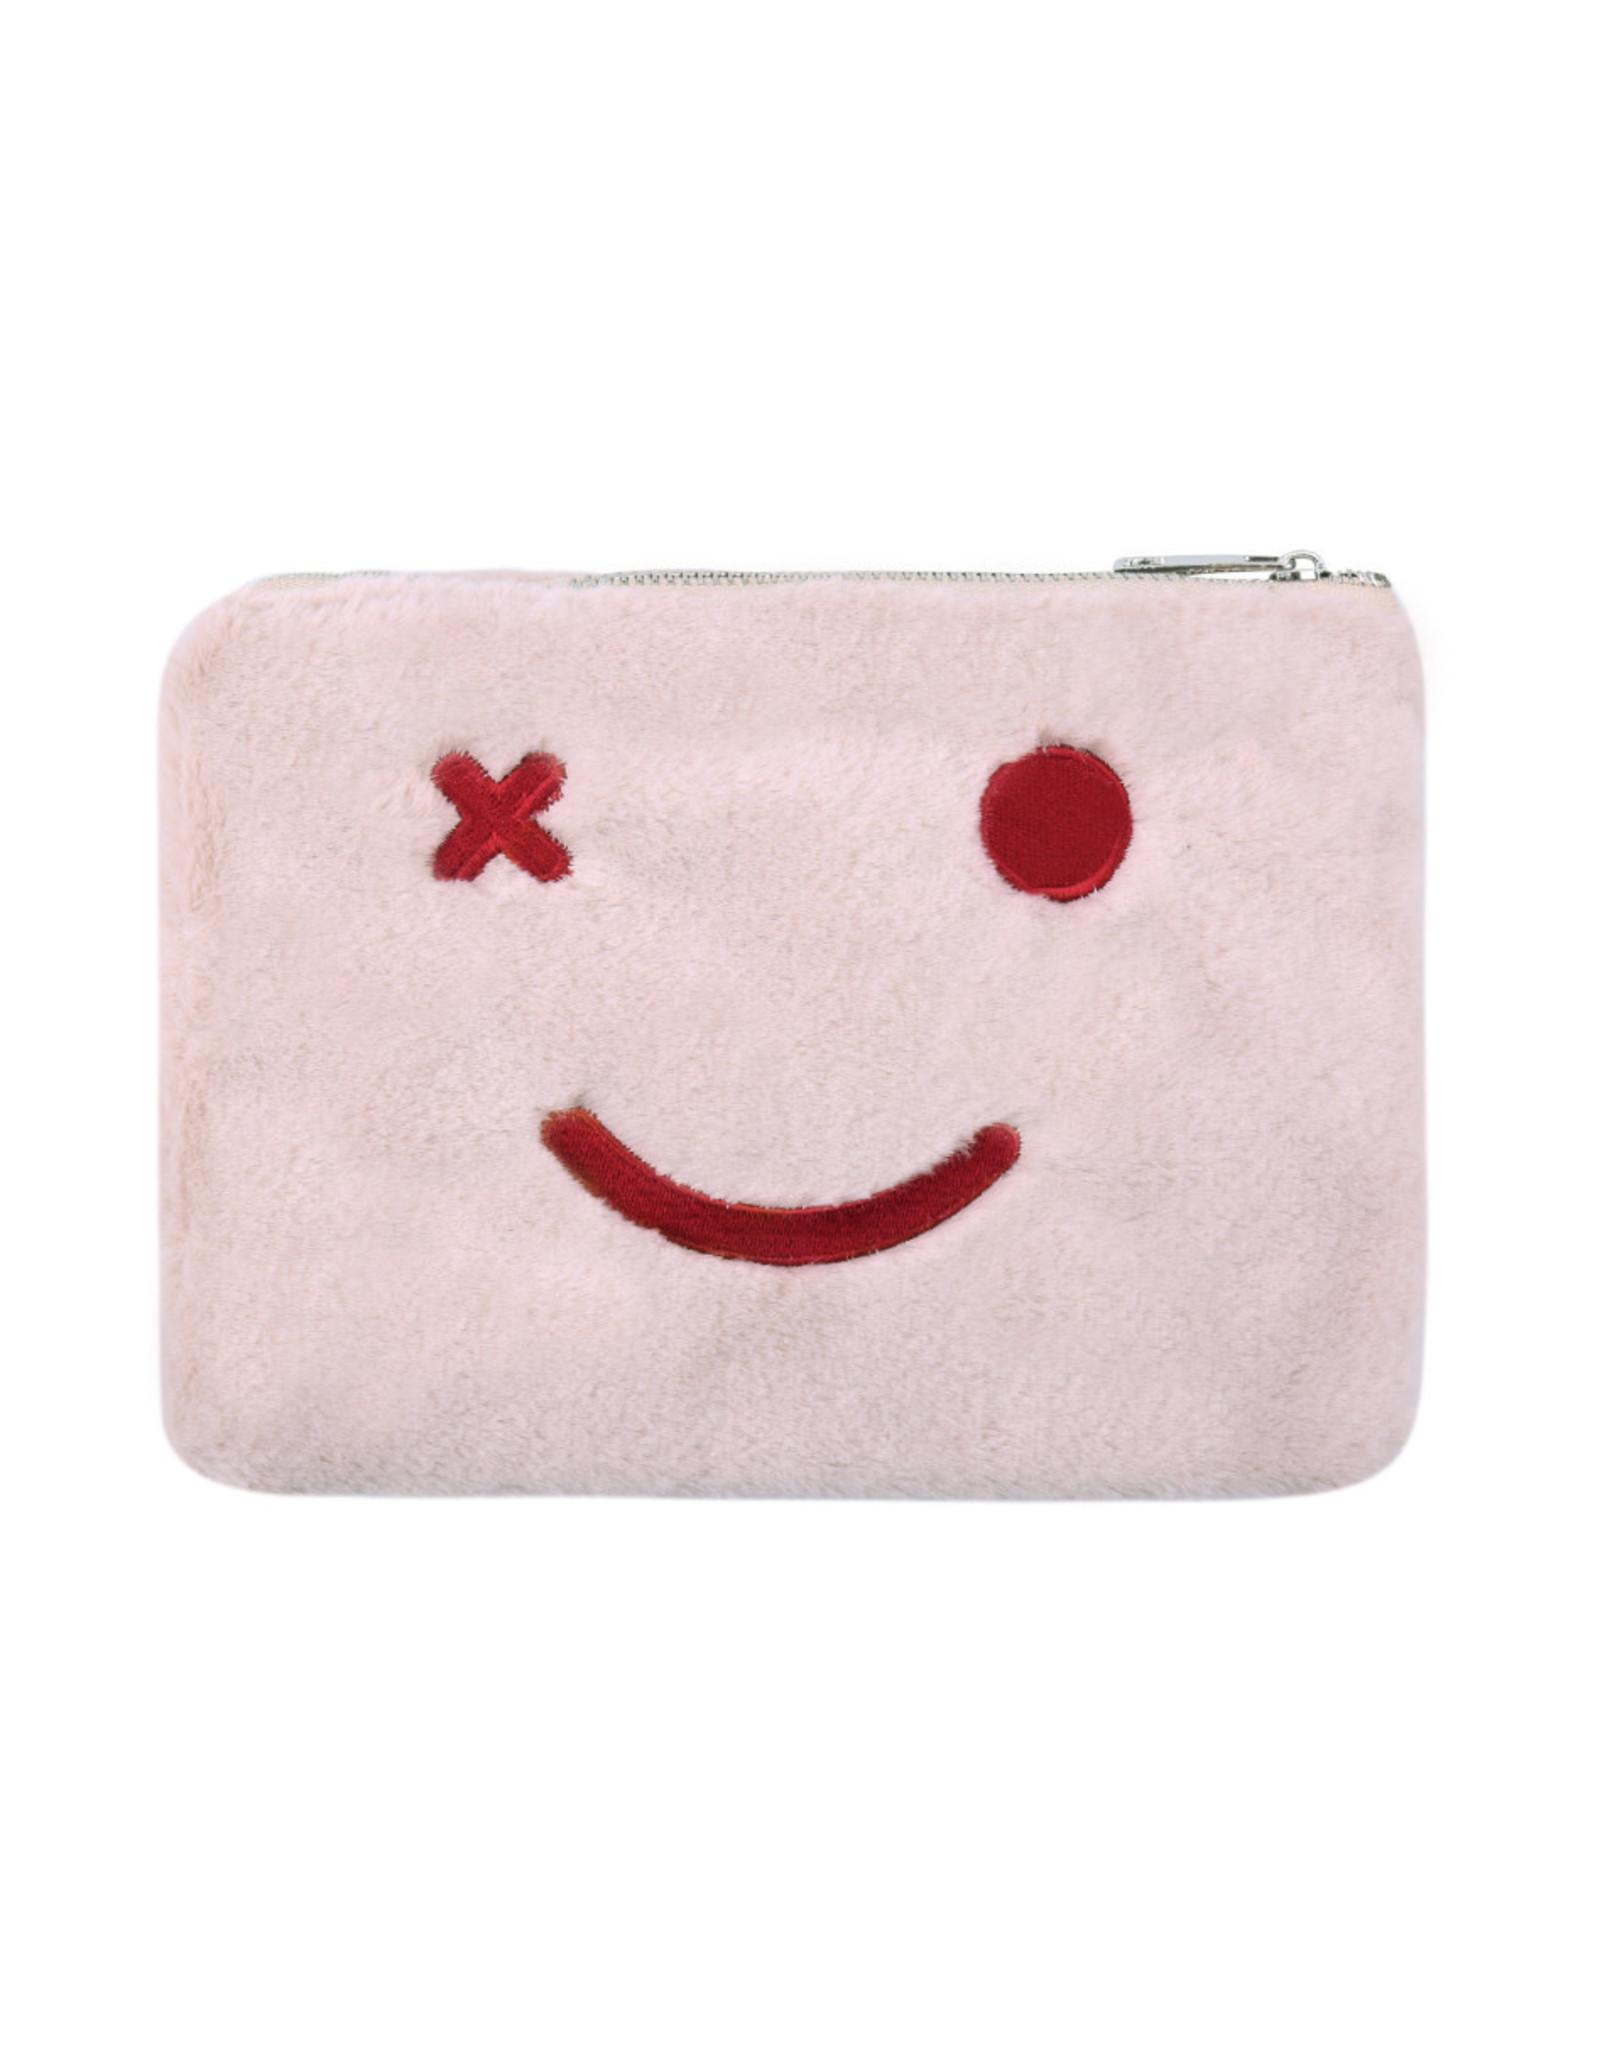 Toiletzakje fluffy smile roze